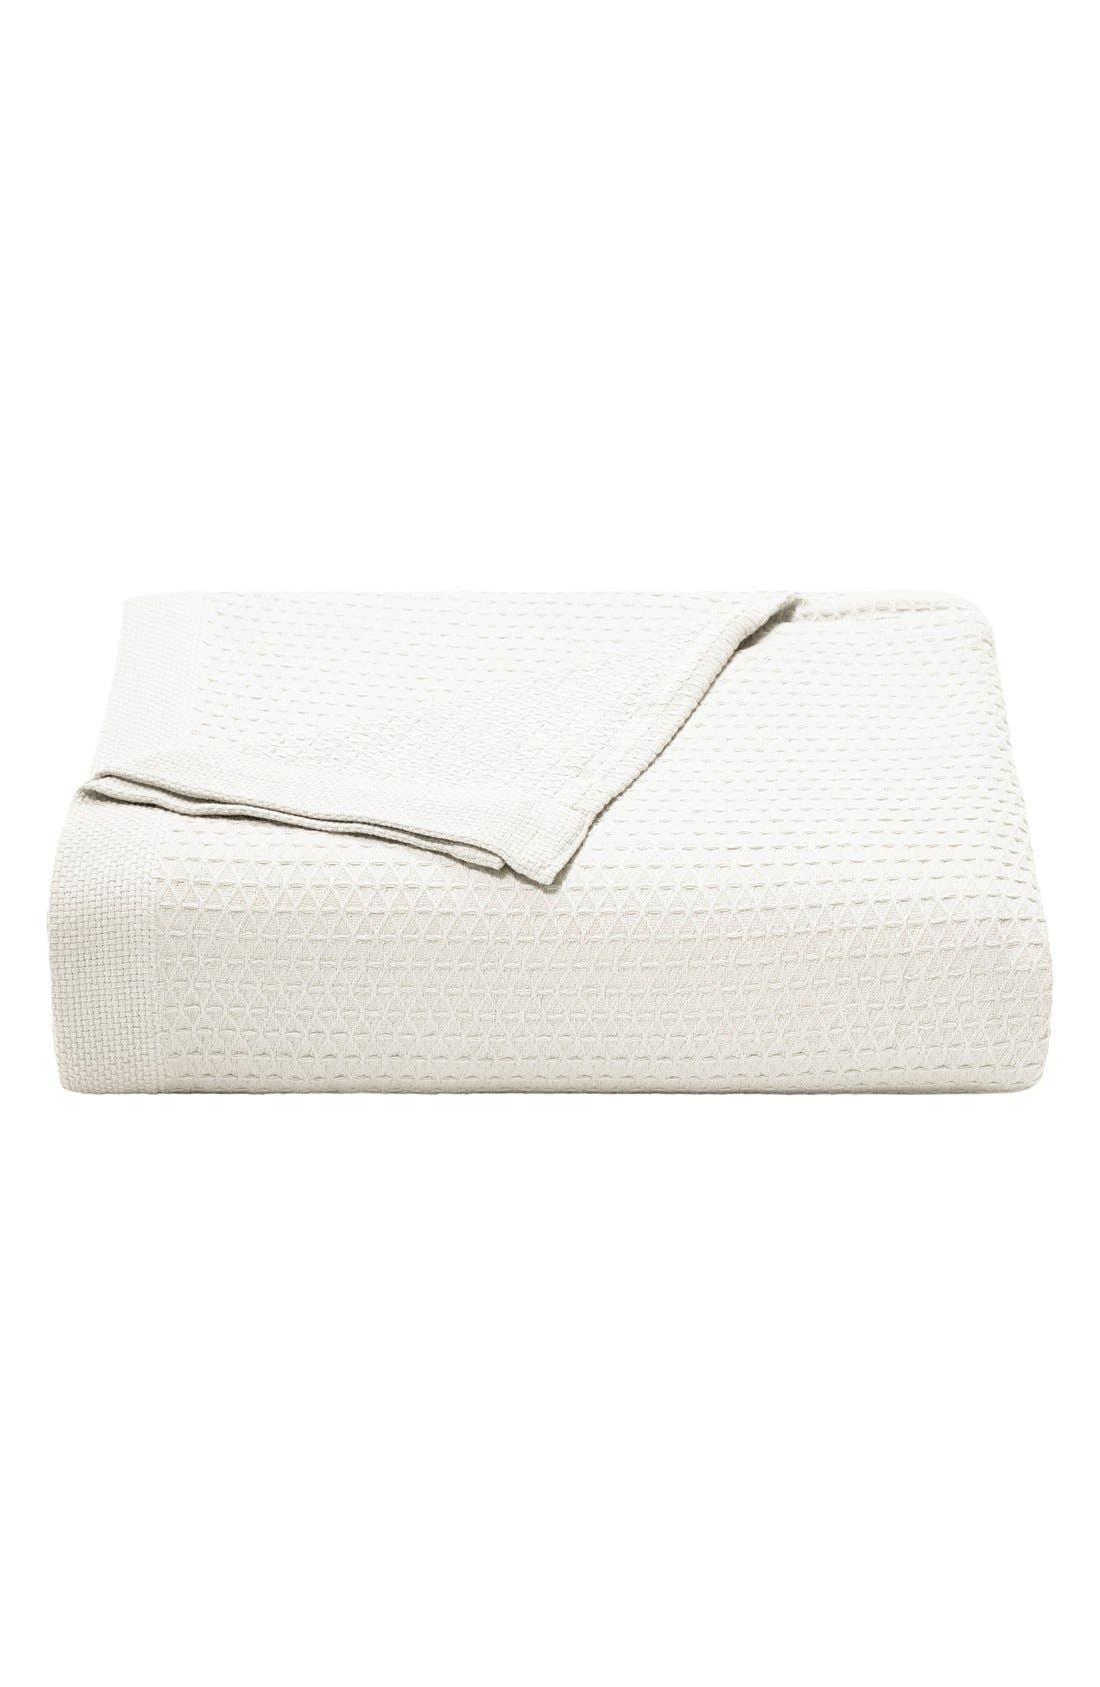 'Baird' Cotton Blanket,                         Main,                         color, WHITE